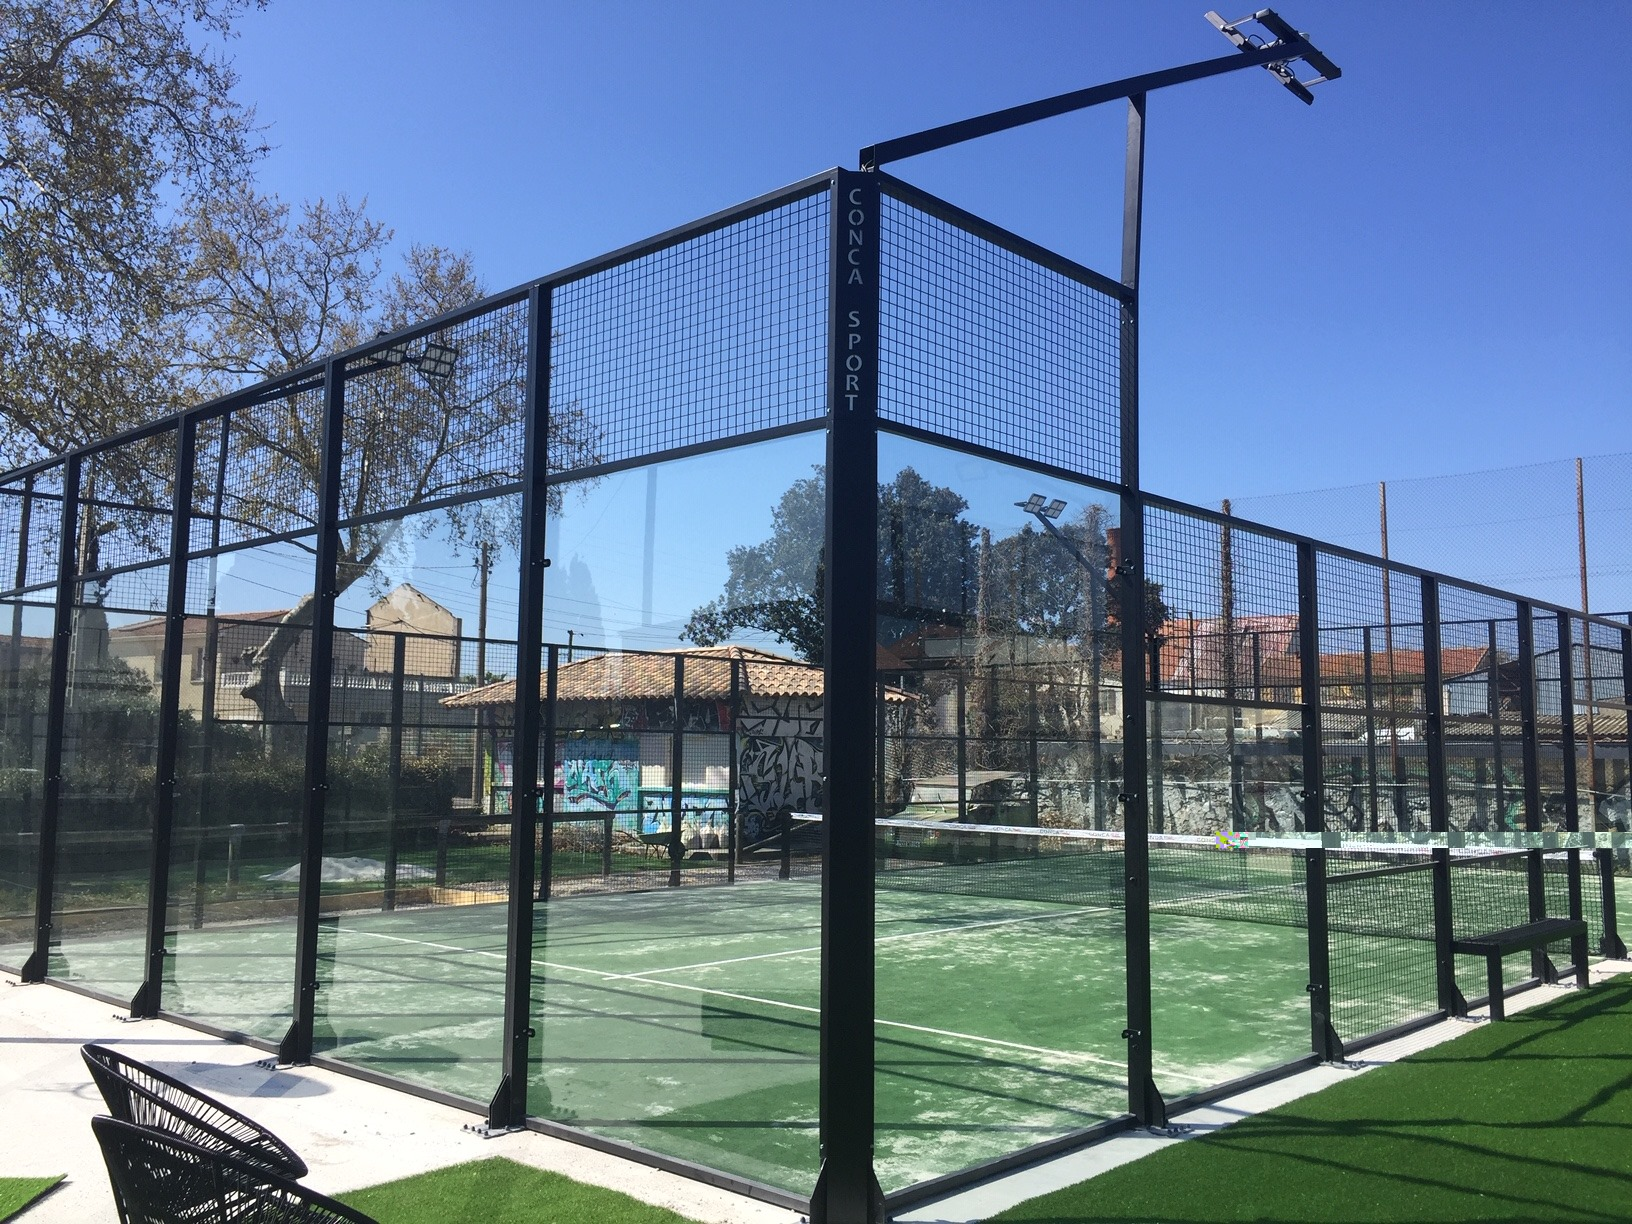 Béziers Padel Club: 6 campi da tennis padel adesso !